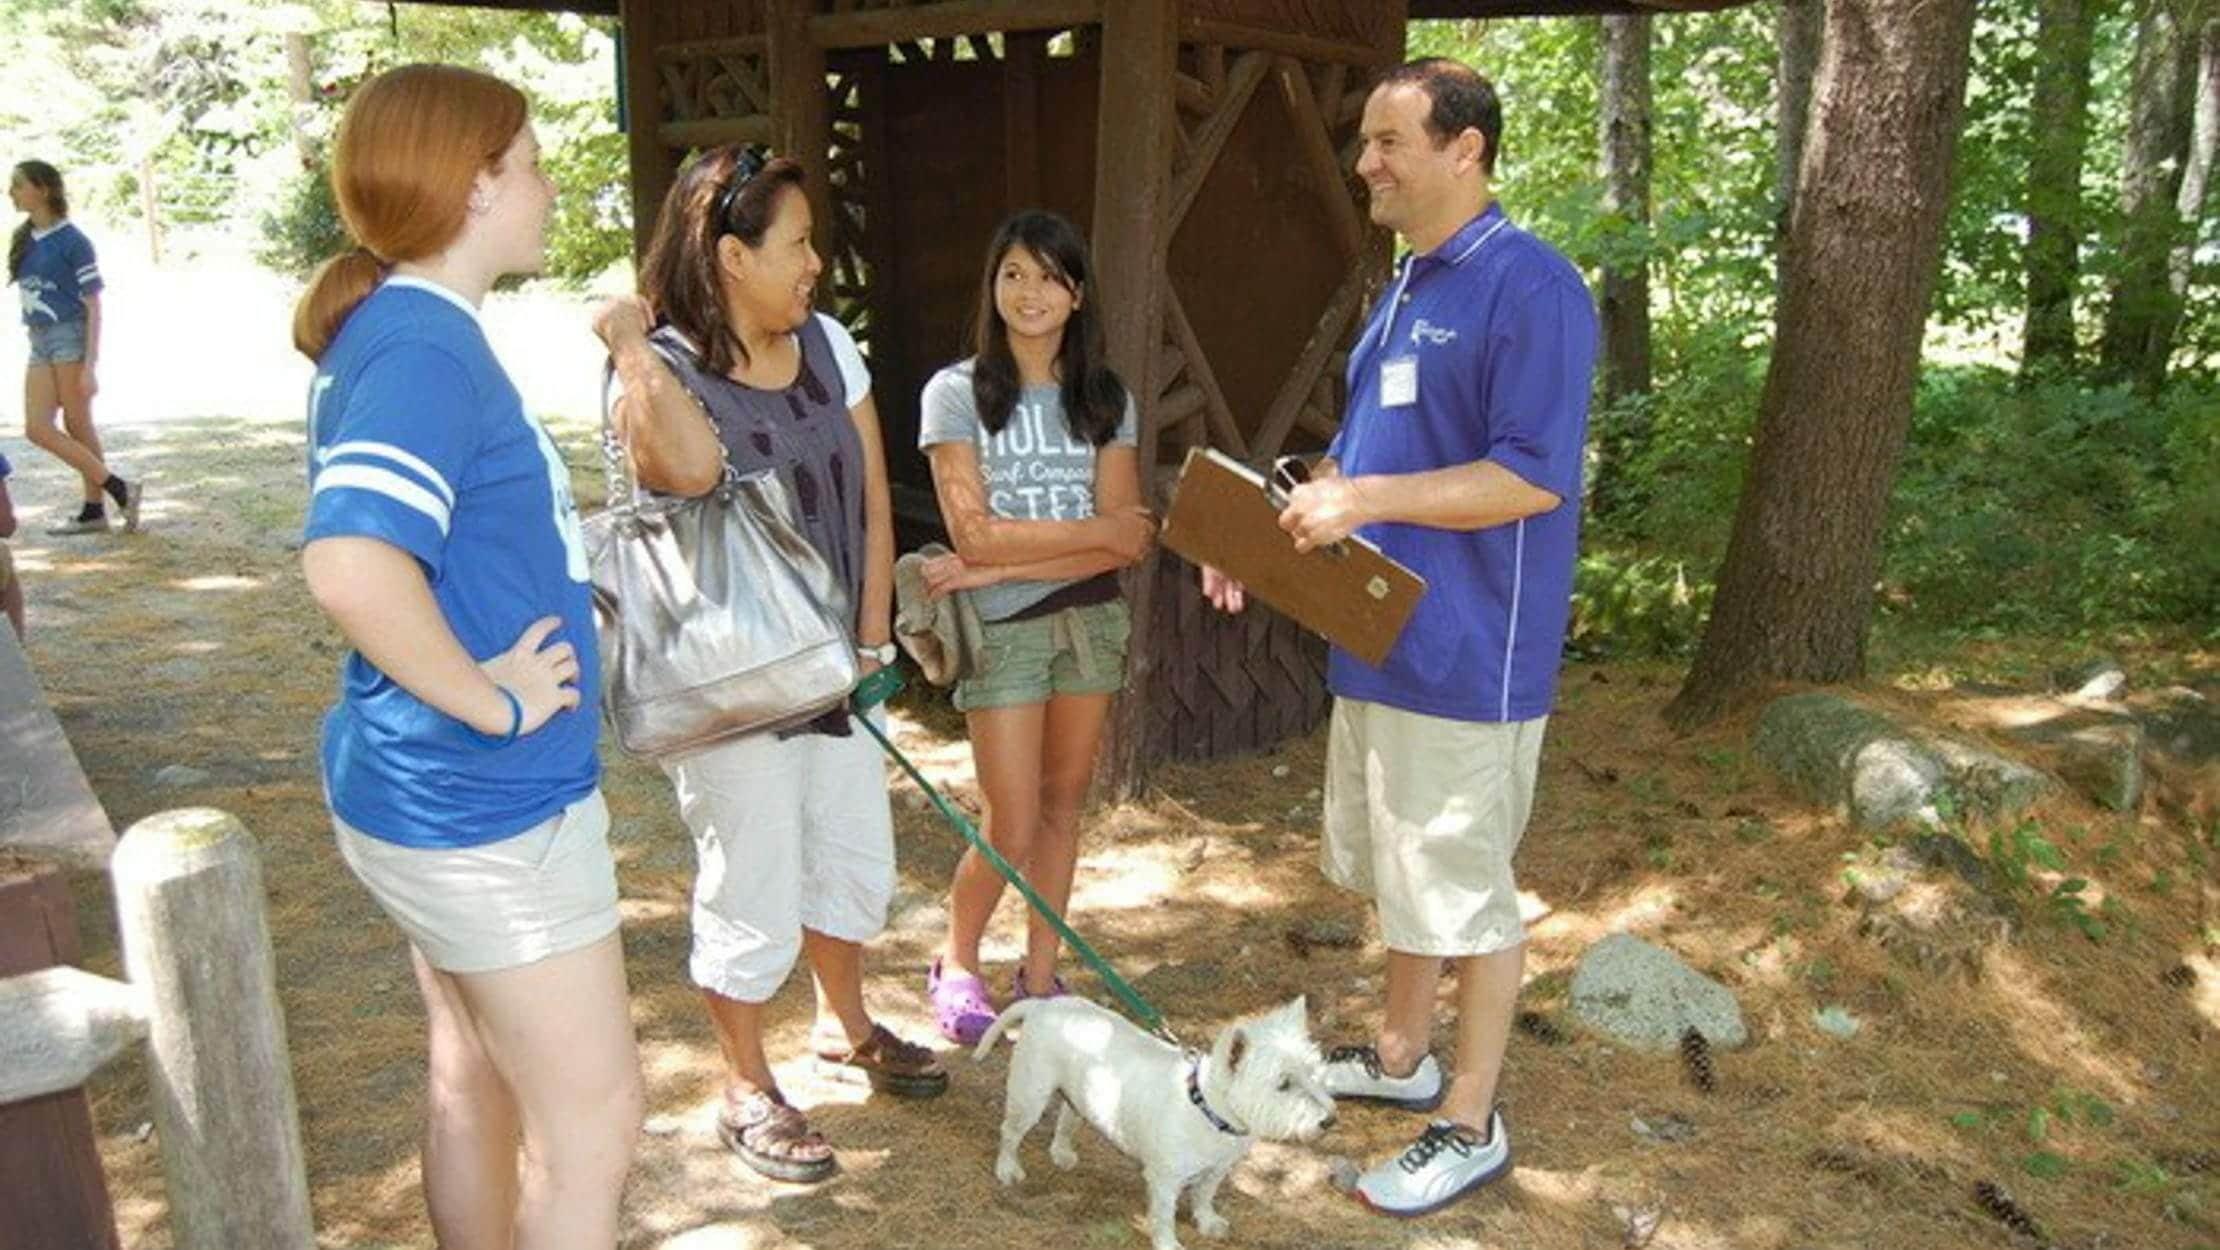 Director/Owner Gregg Parker speaking with Camp Waziyatah parents